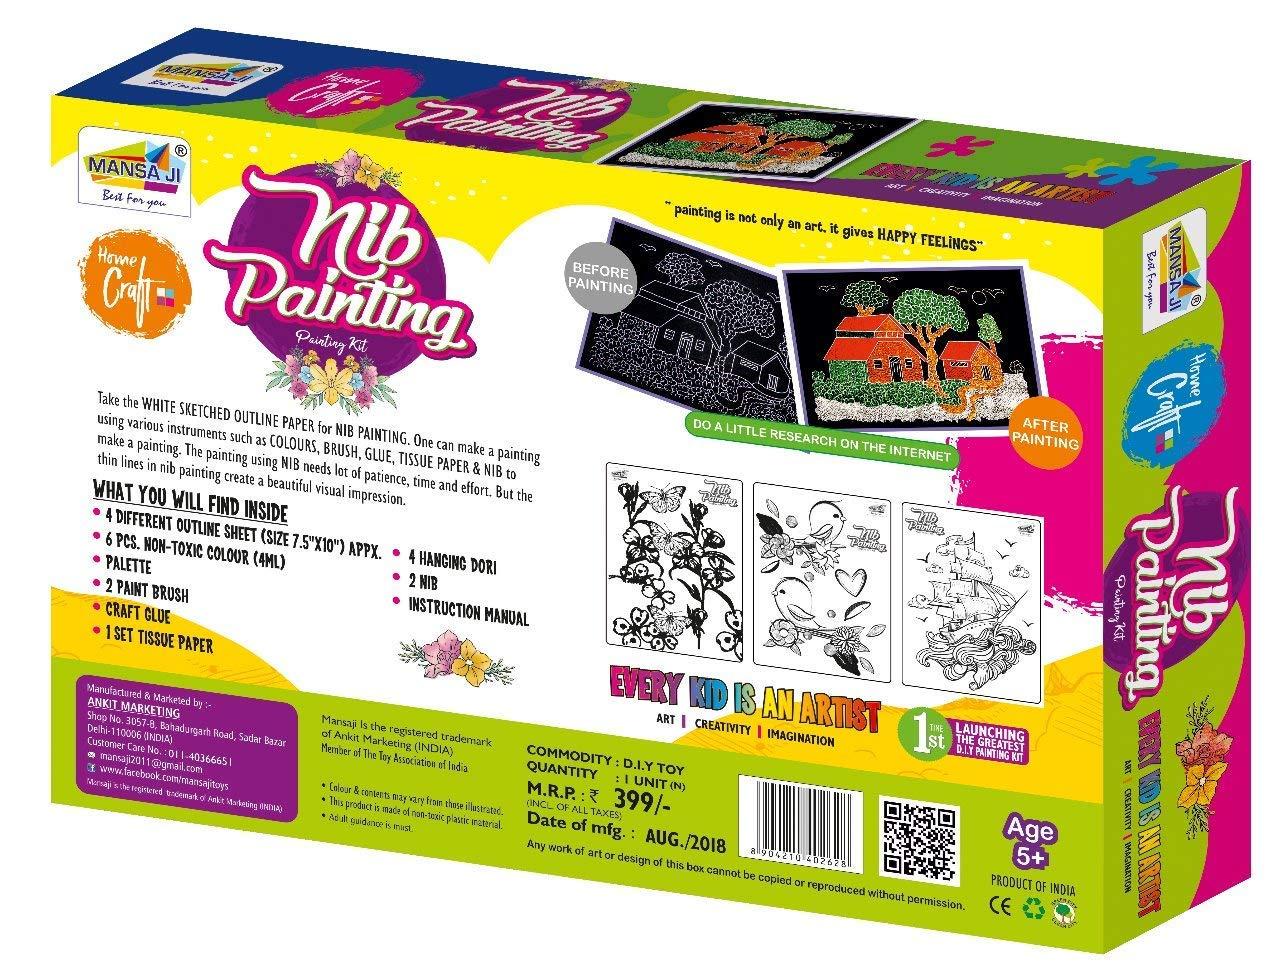 Mansaji's Beautiful Nib Painting Kit For Kids